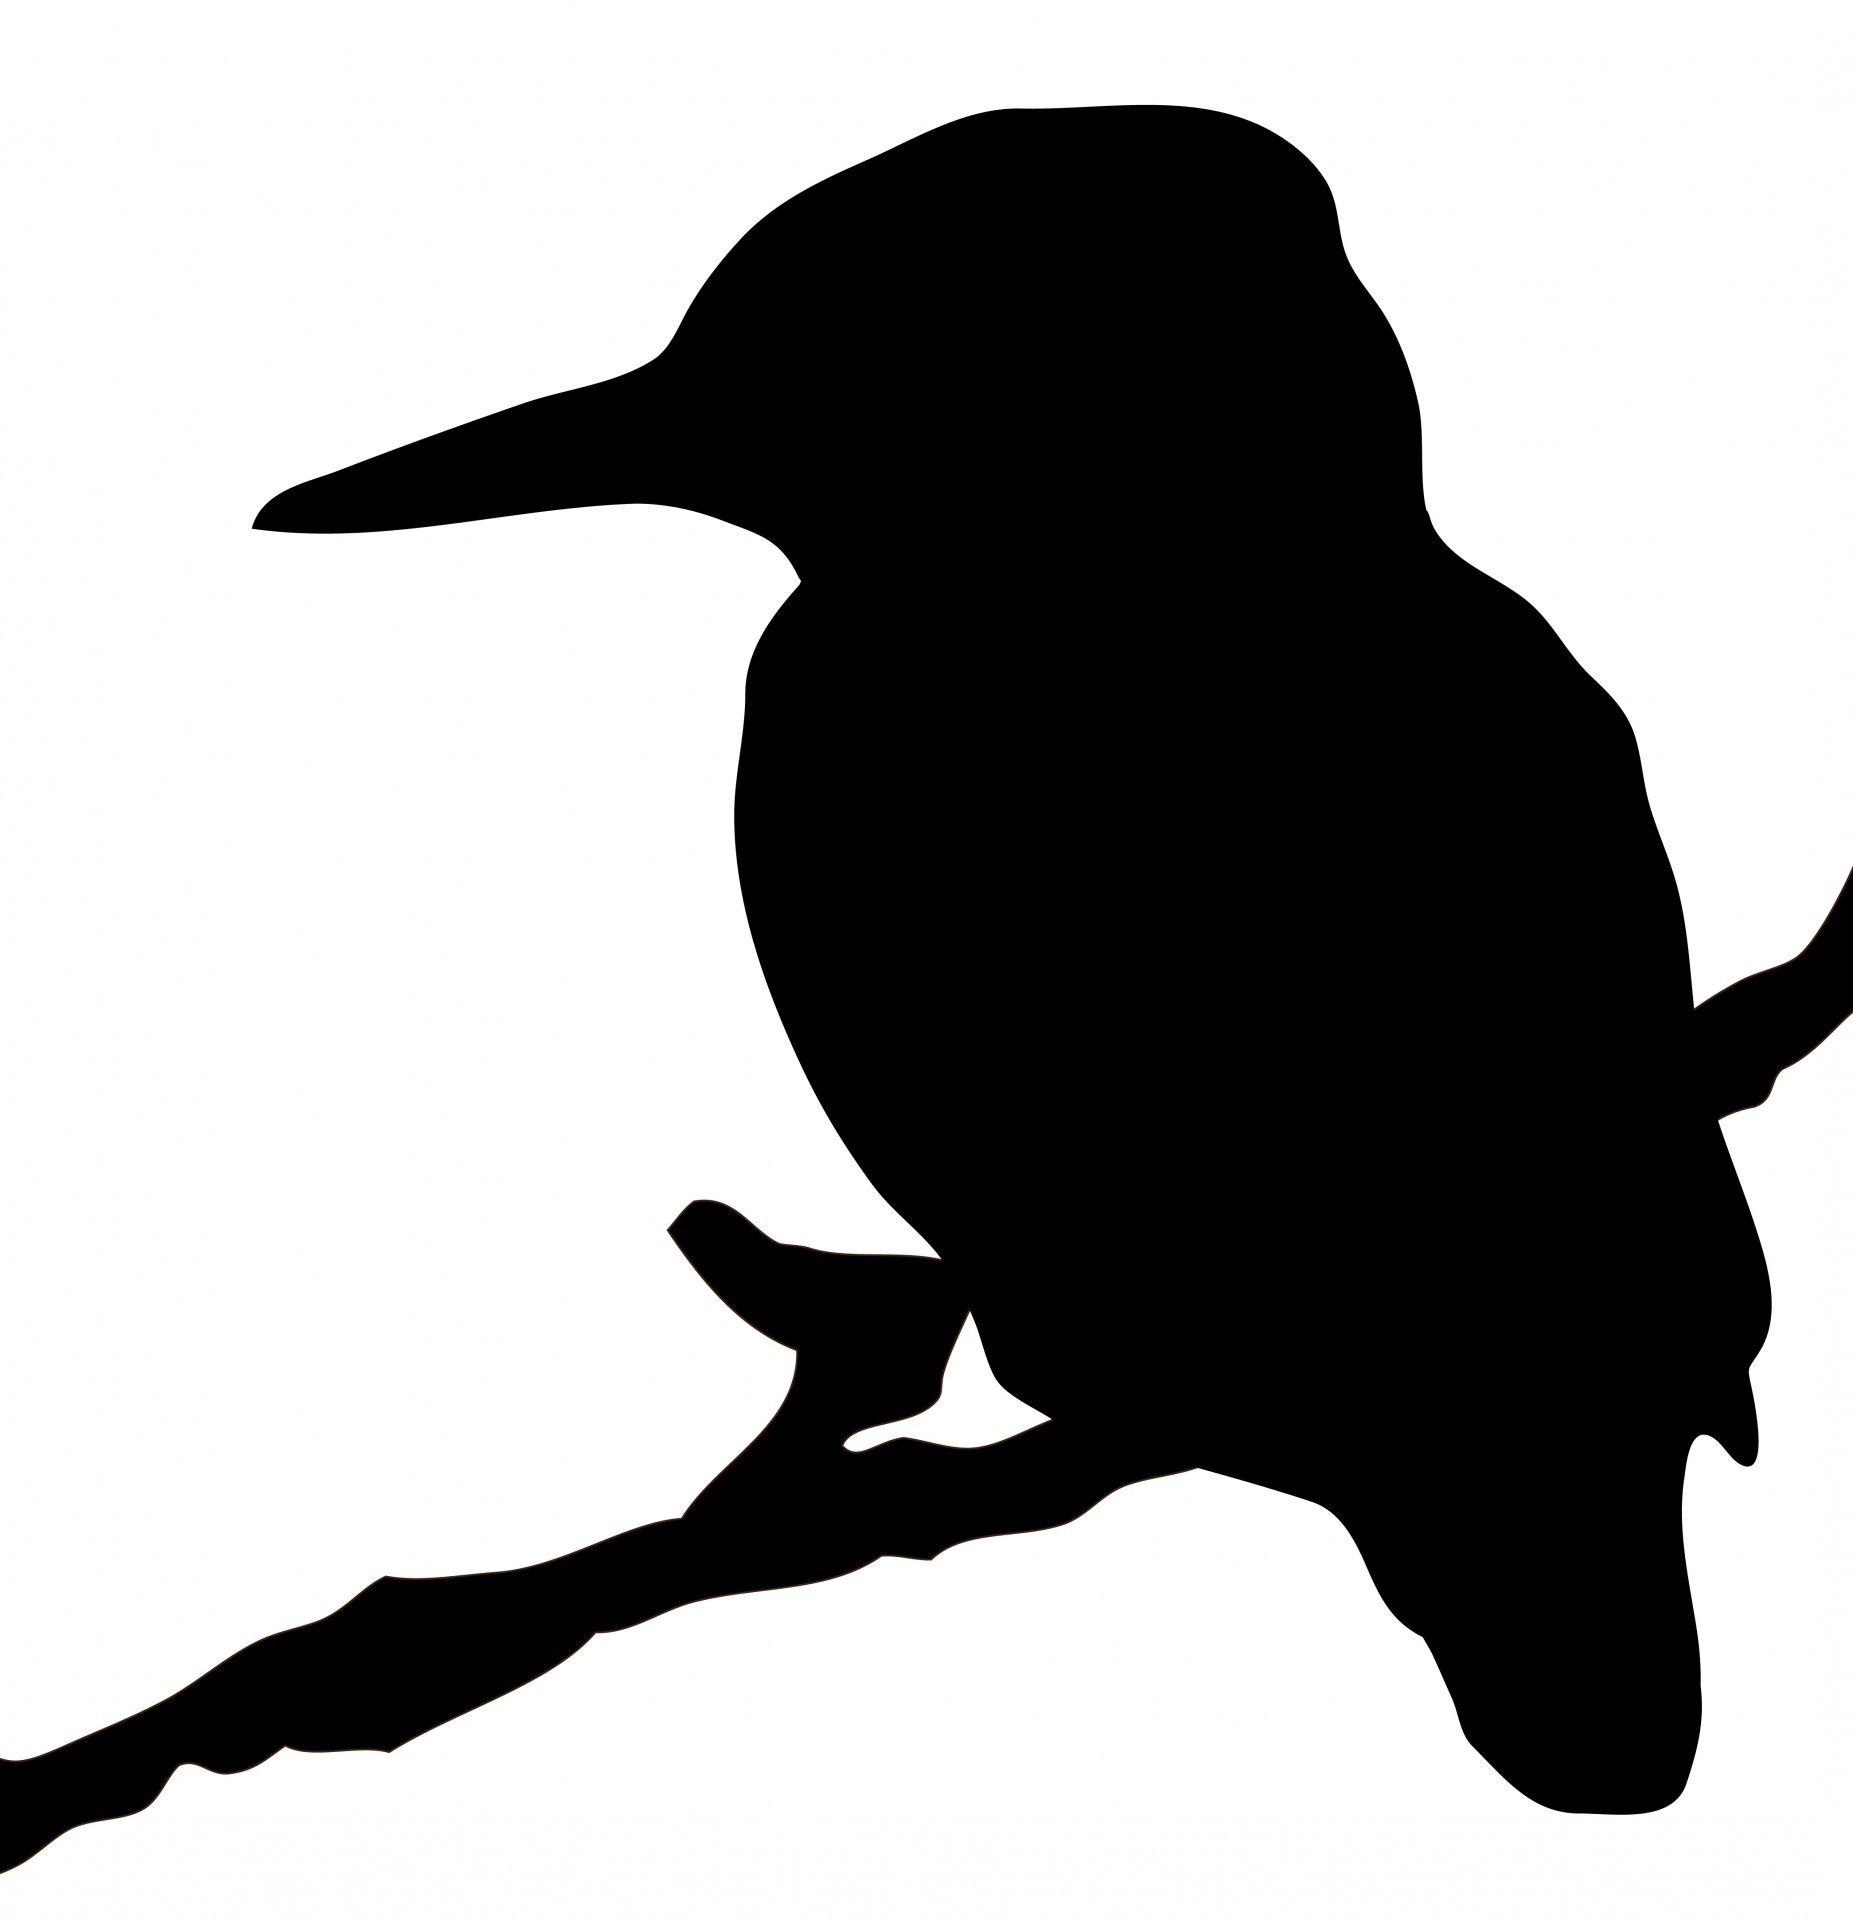 Kingfisher Bird Silhouette Clipart Free Stock Photo Public